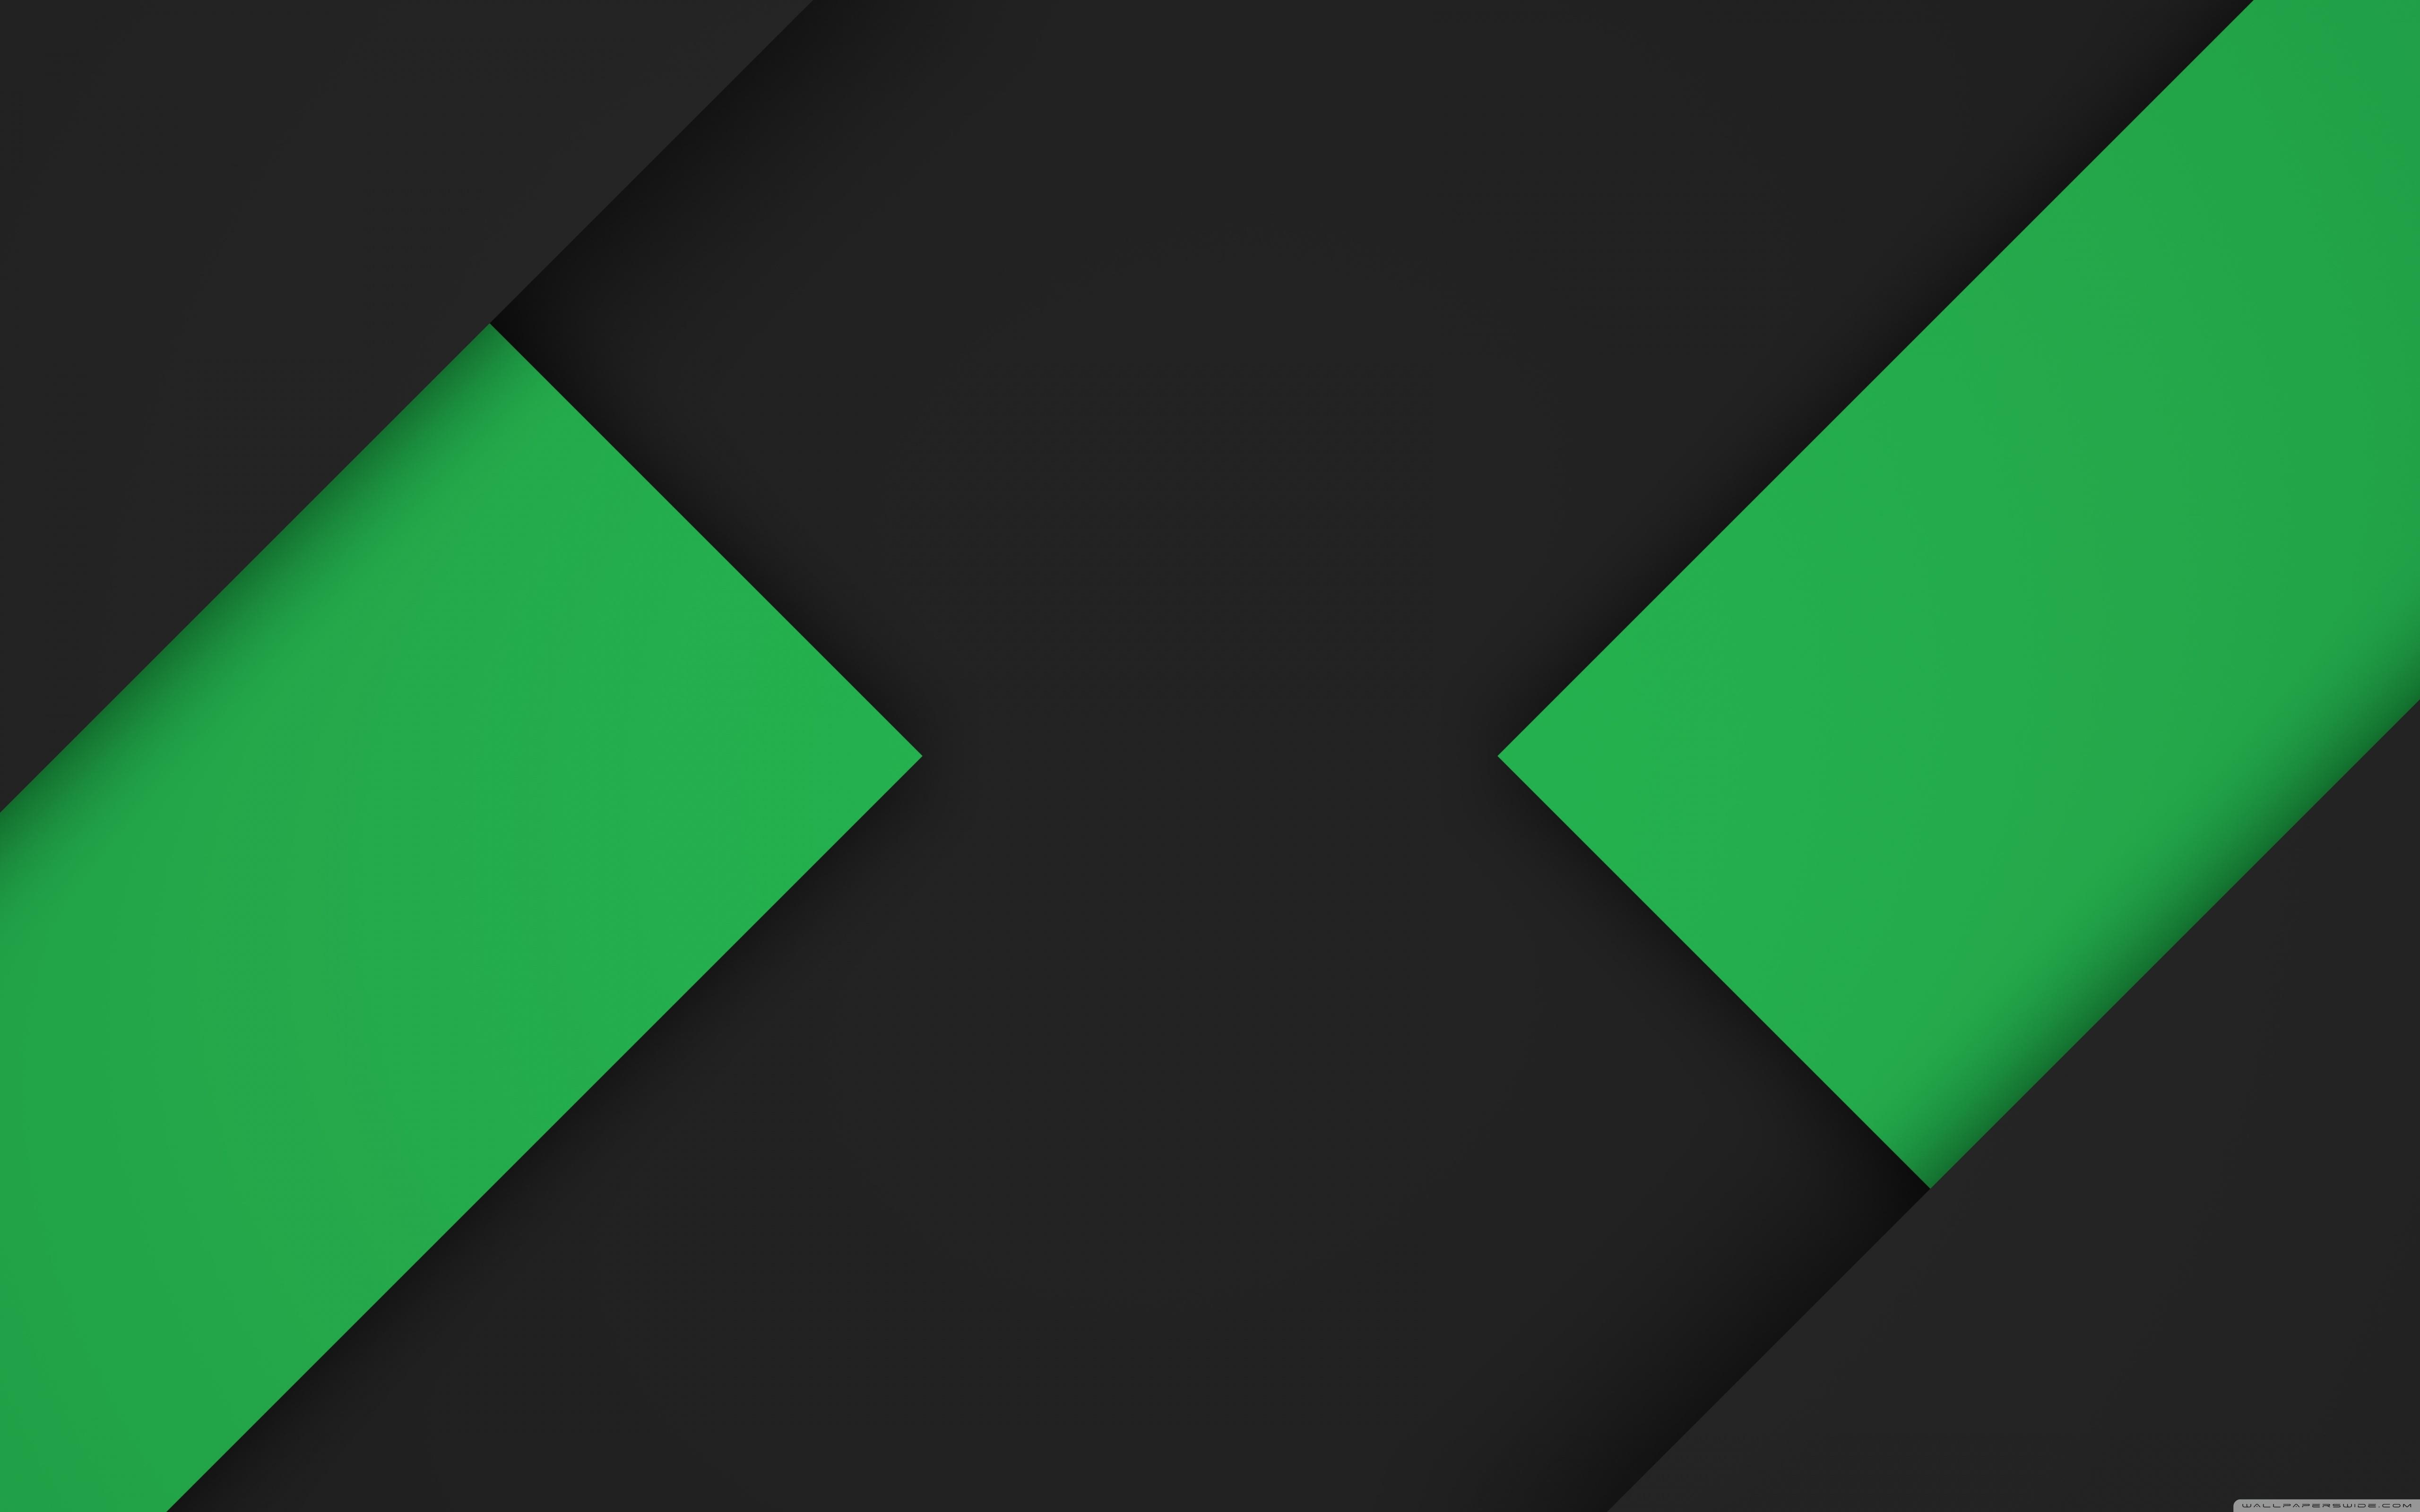 16k material dark green ❤ 4k hd desktop wallpaper for • wide